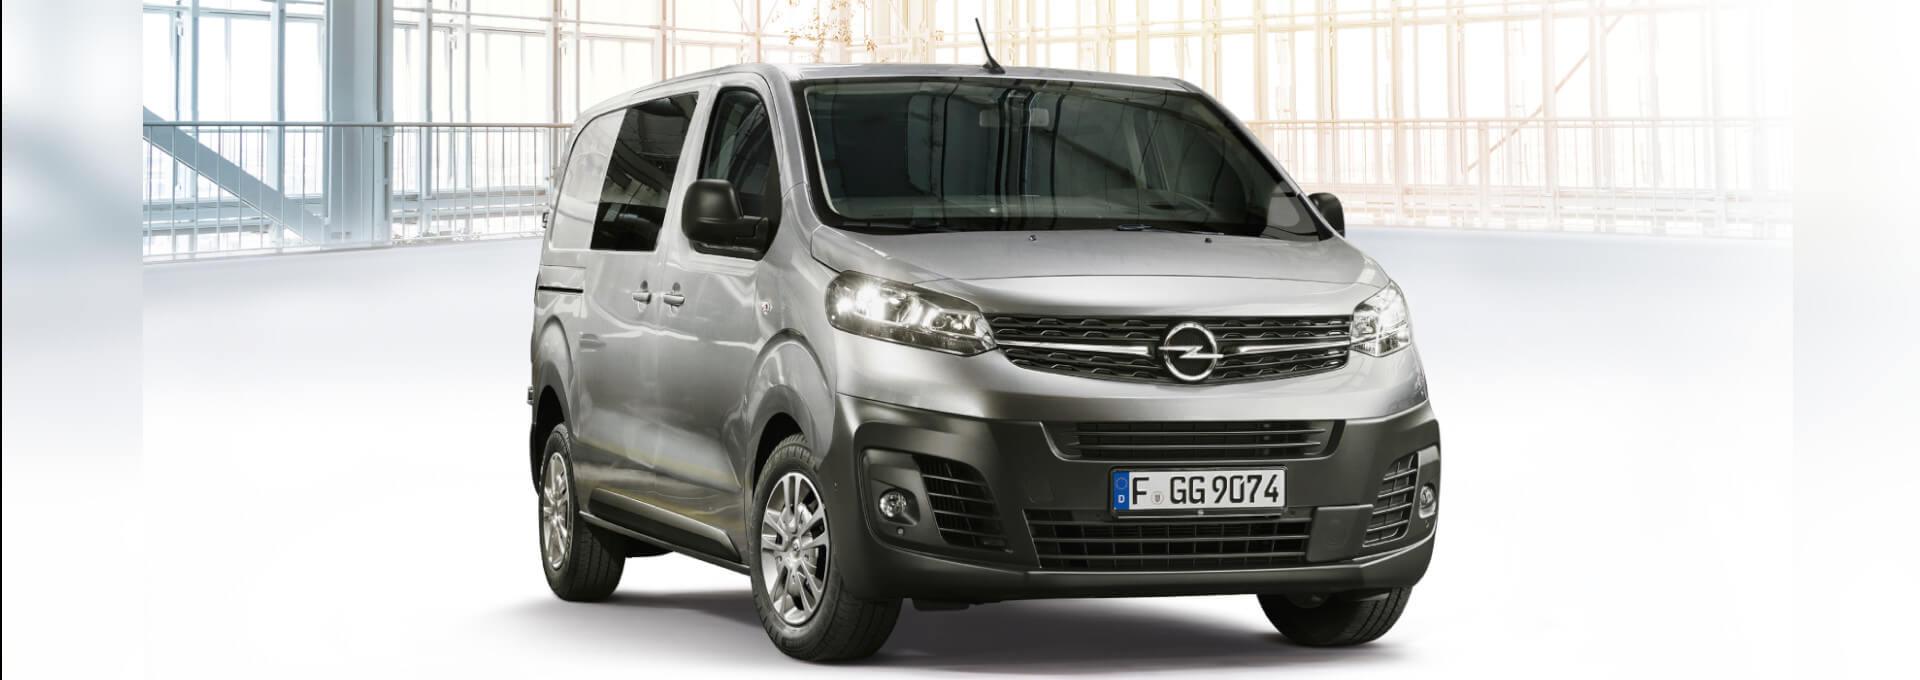 Opel Vivaro Kastenwagen in Industriehalle